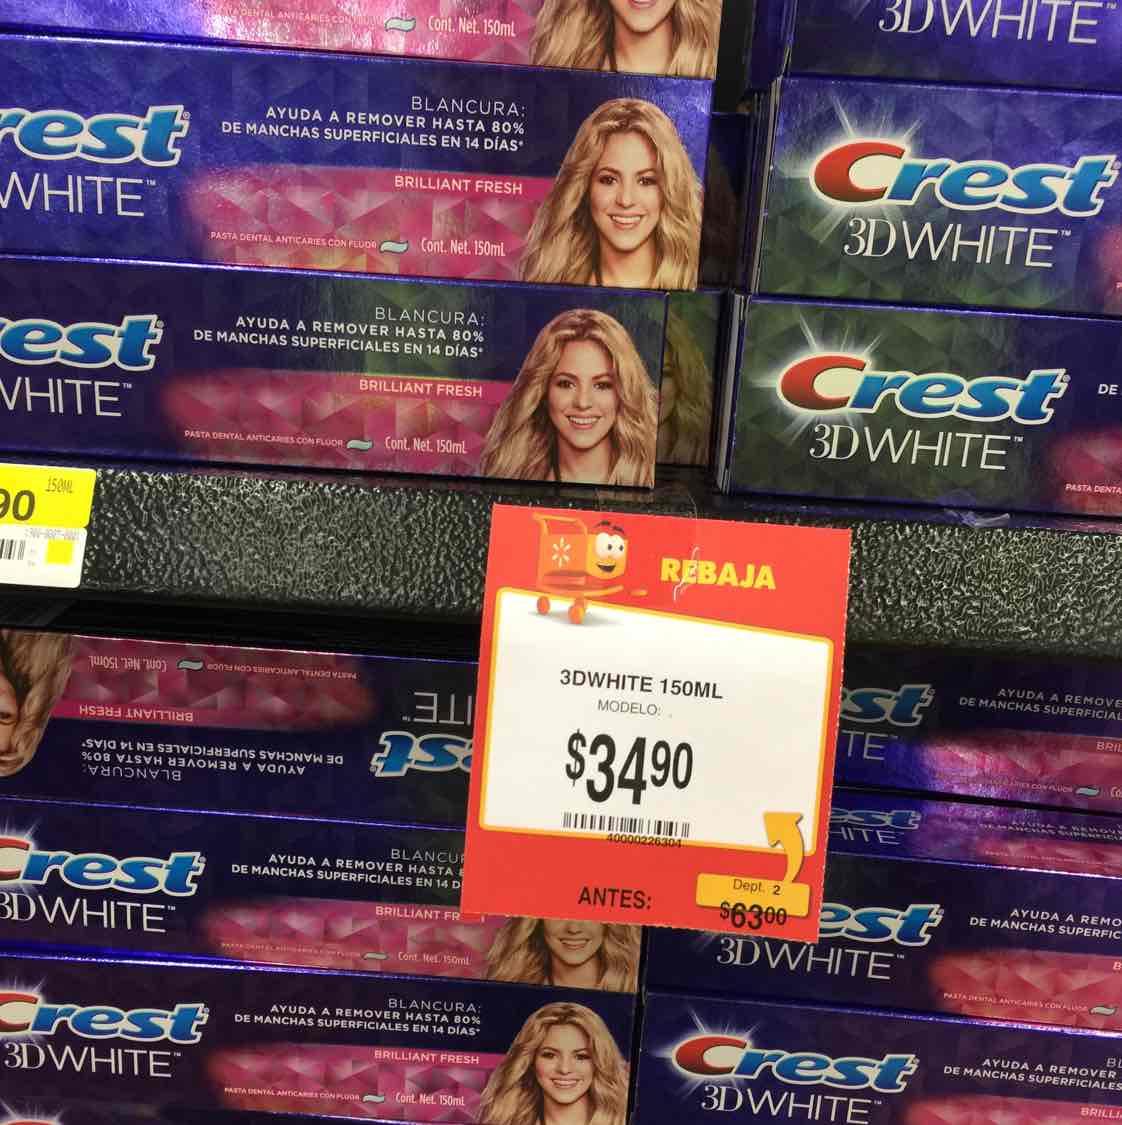 Walmart: Crest White 3D a $34.90